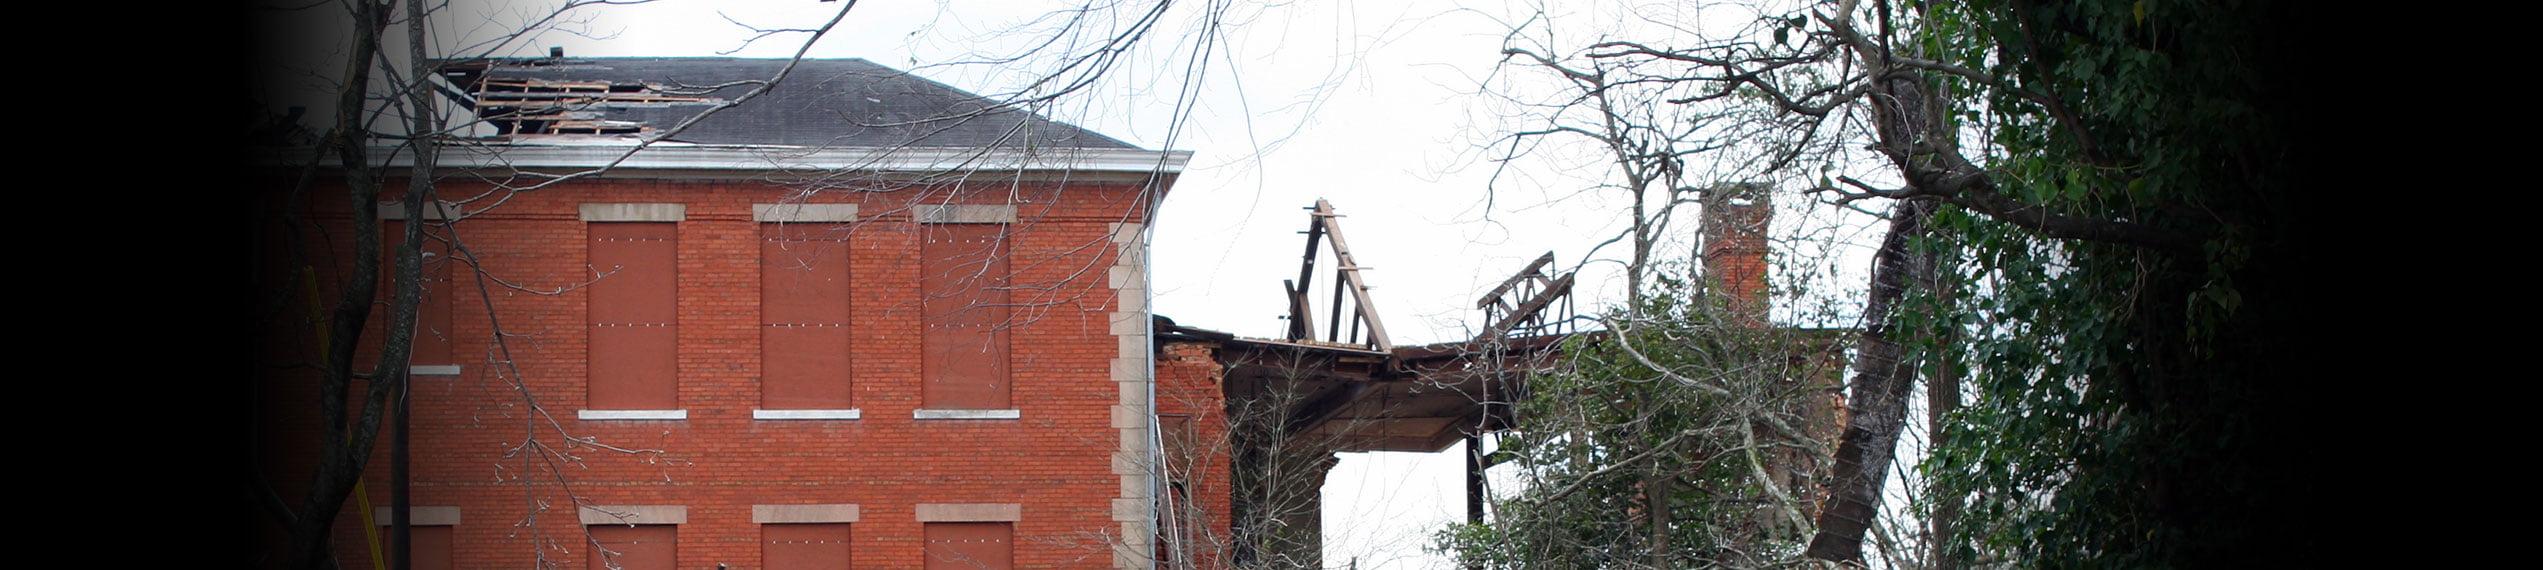 Wind & Storm Damage Repairs in Paul Davis Restoration of St Augustine